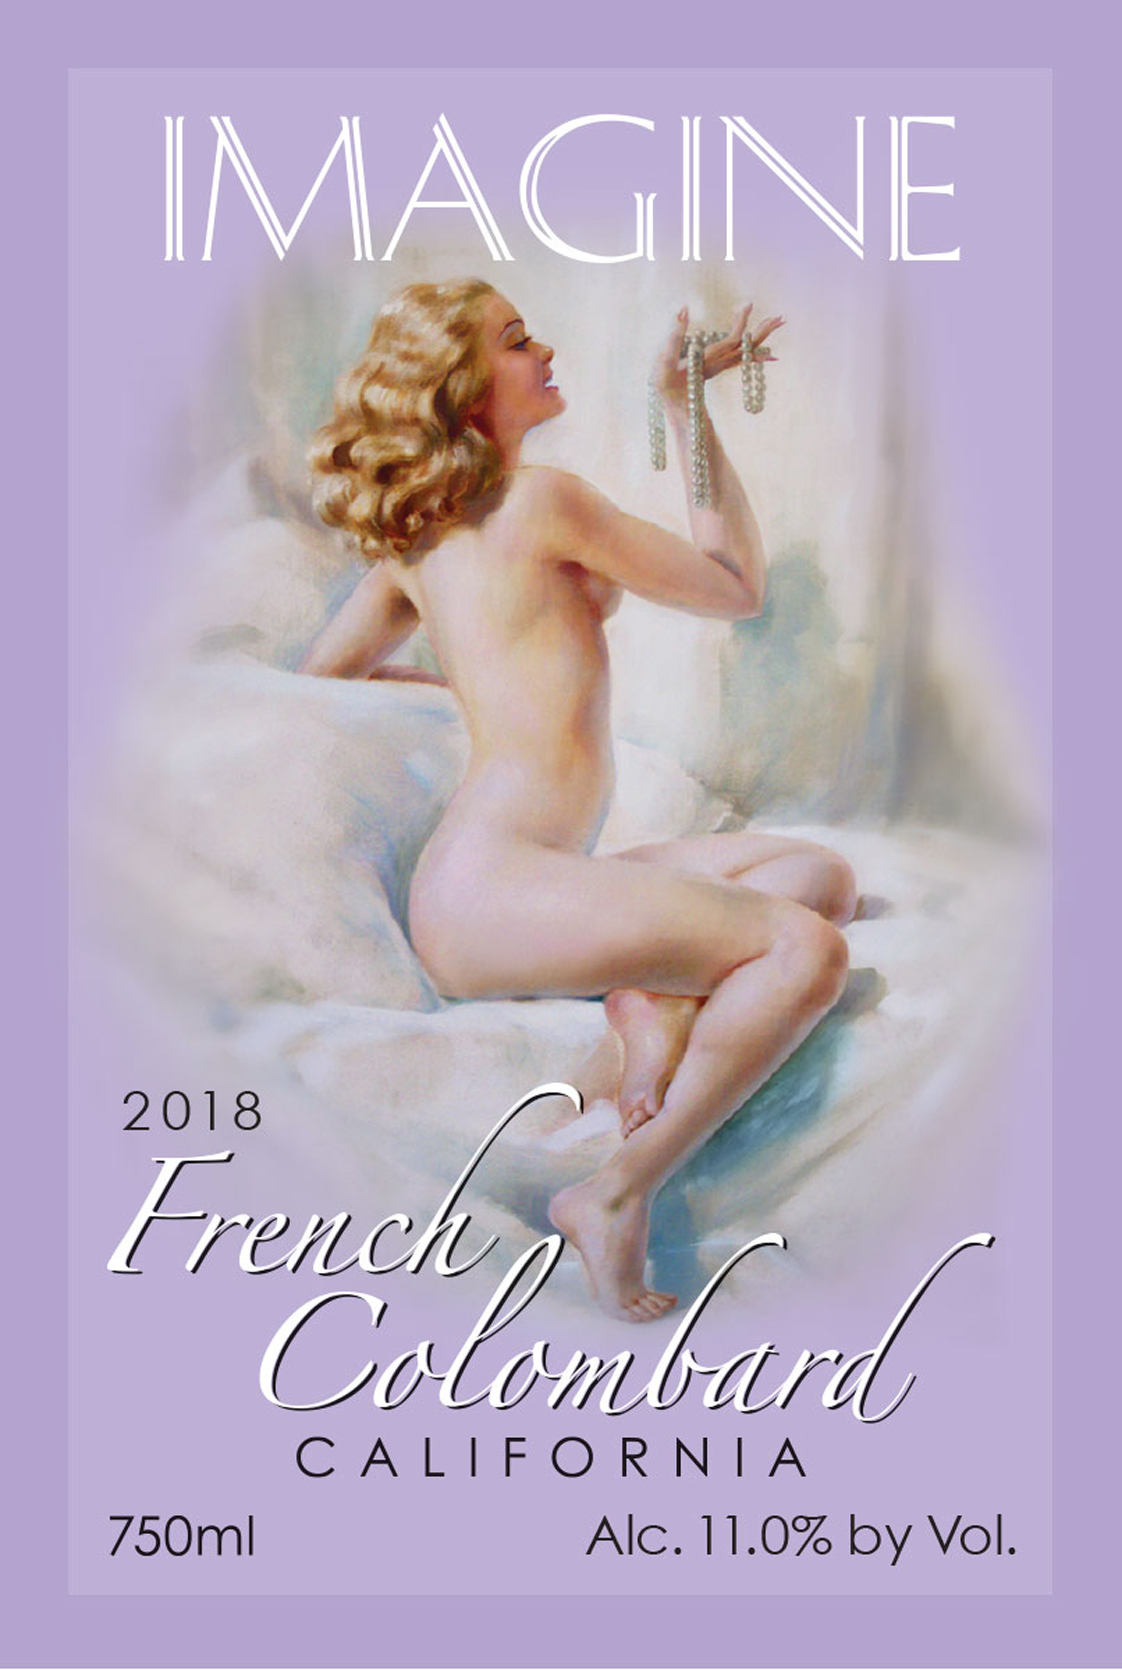 2018 French Columbard